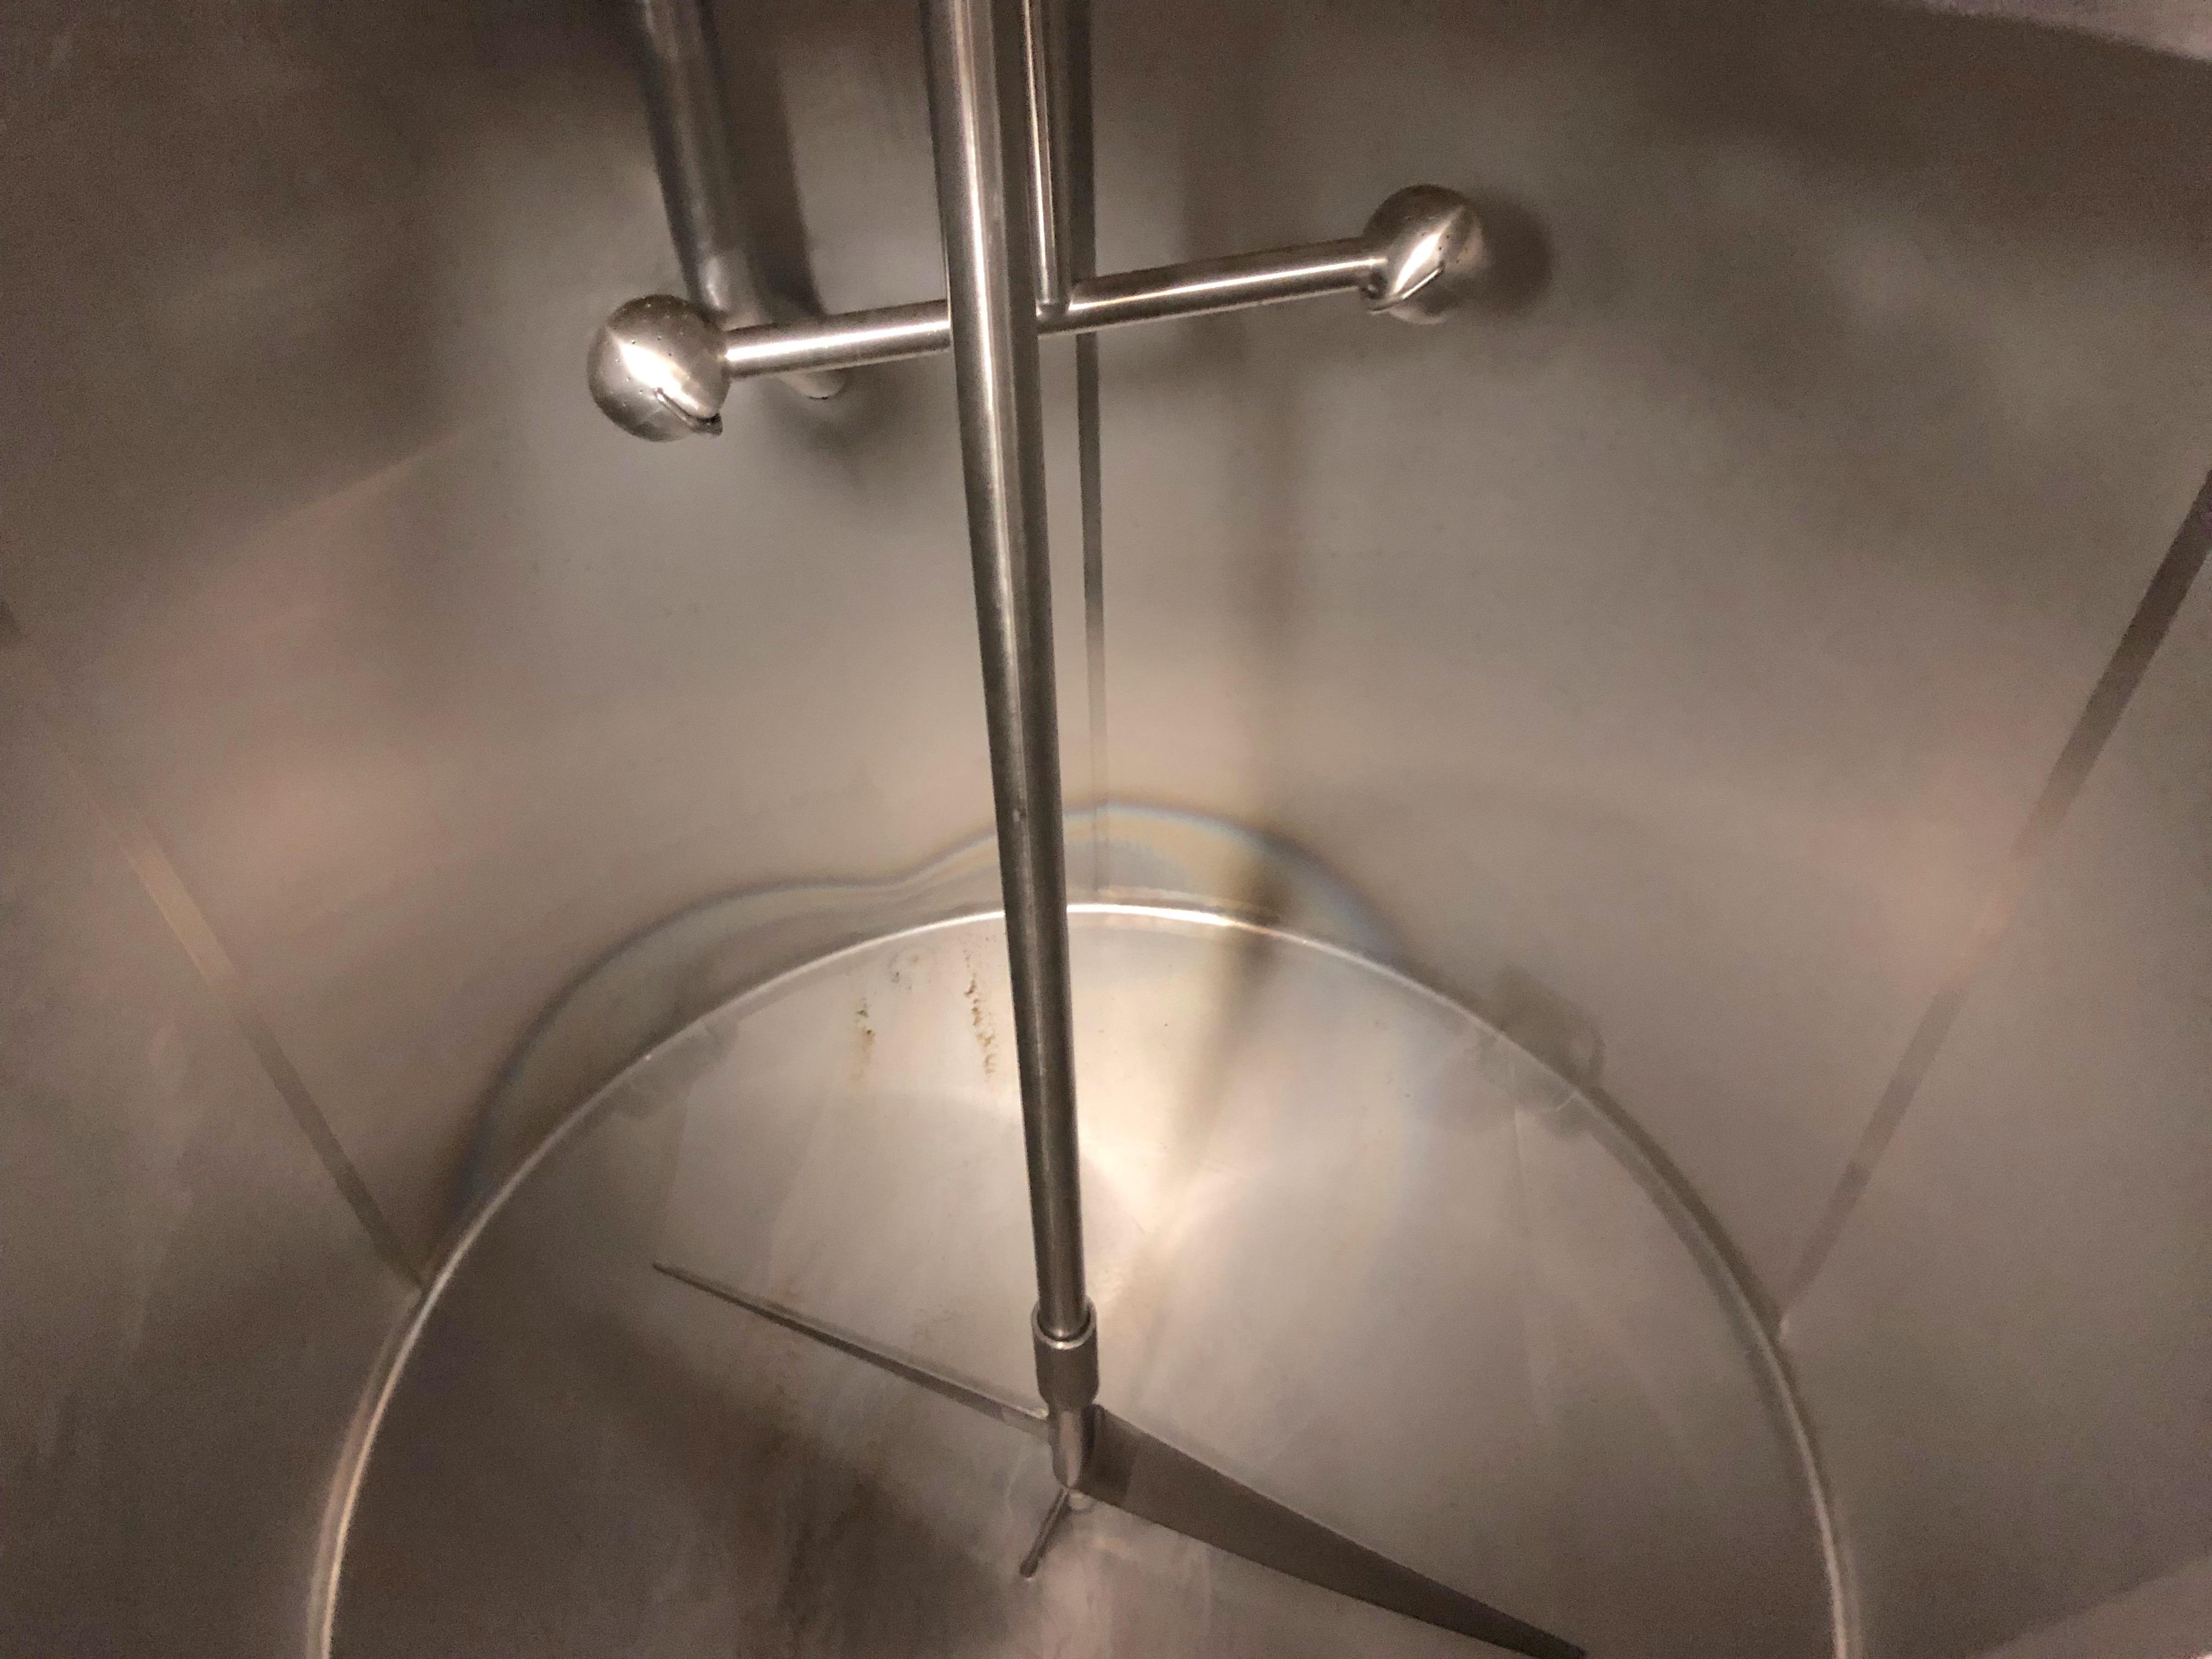 Lot 38 - Mueller 1200 Gallon Stainless Steel Vertical Mixing Tank